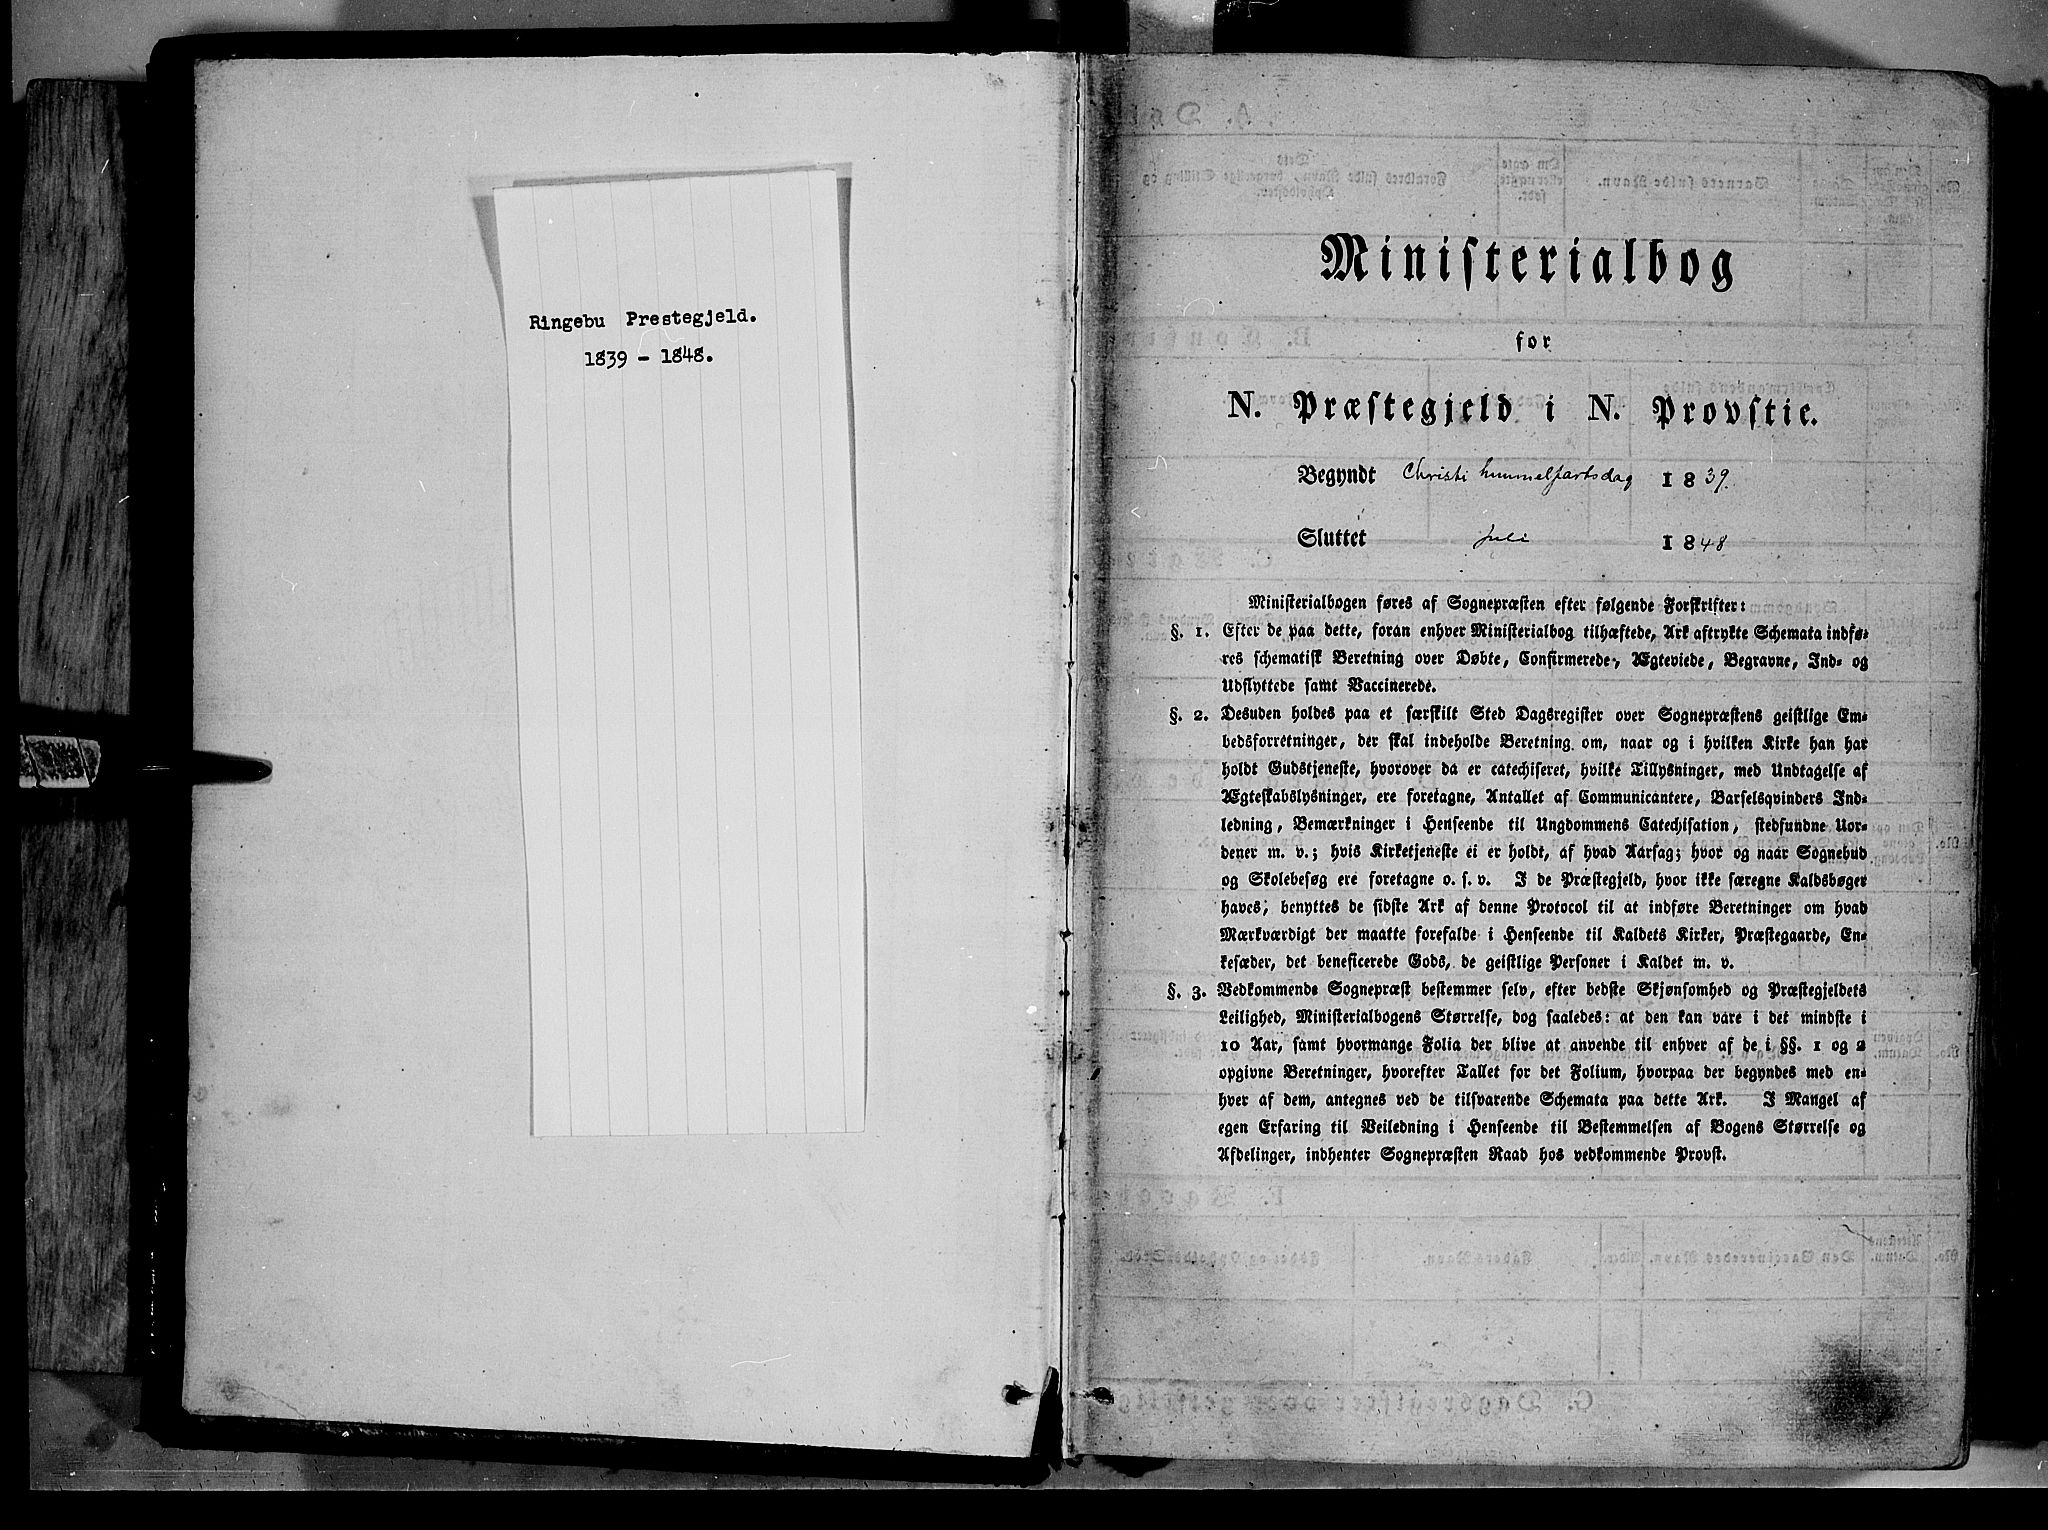 SAH, Ringebu prestekontor, Ministerialbok nr. 5, 1839-1848